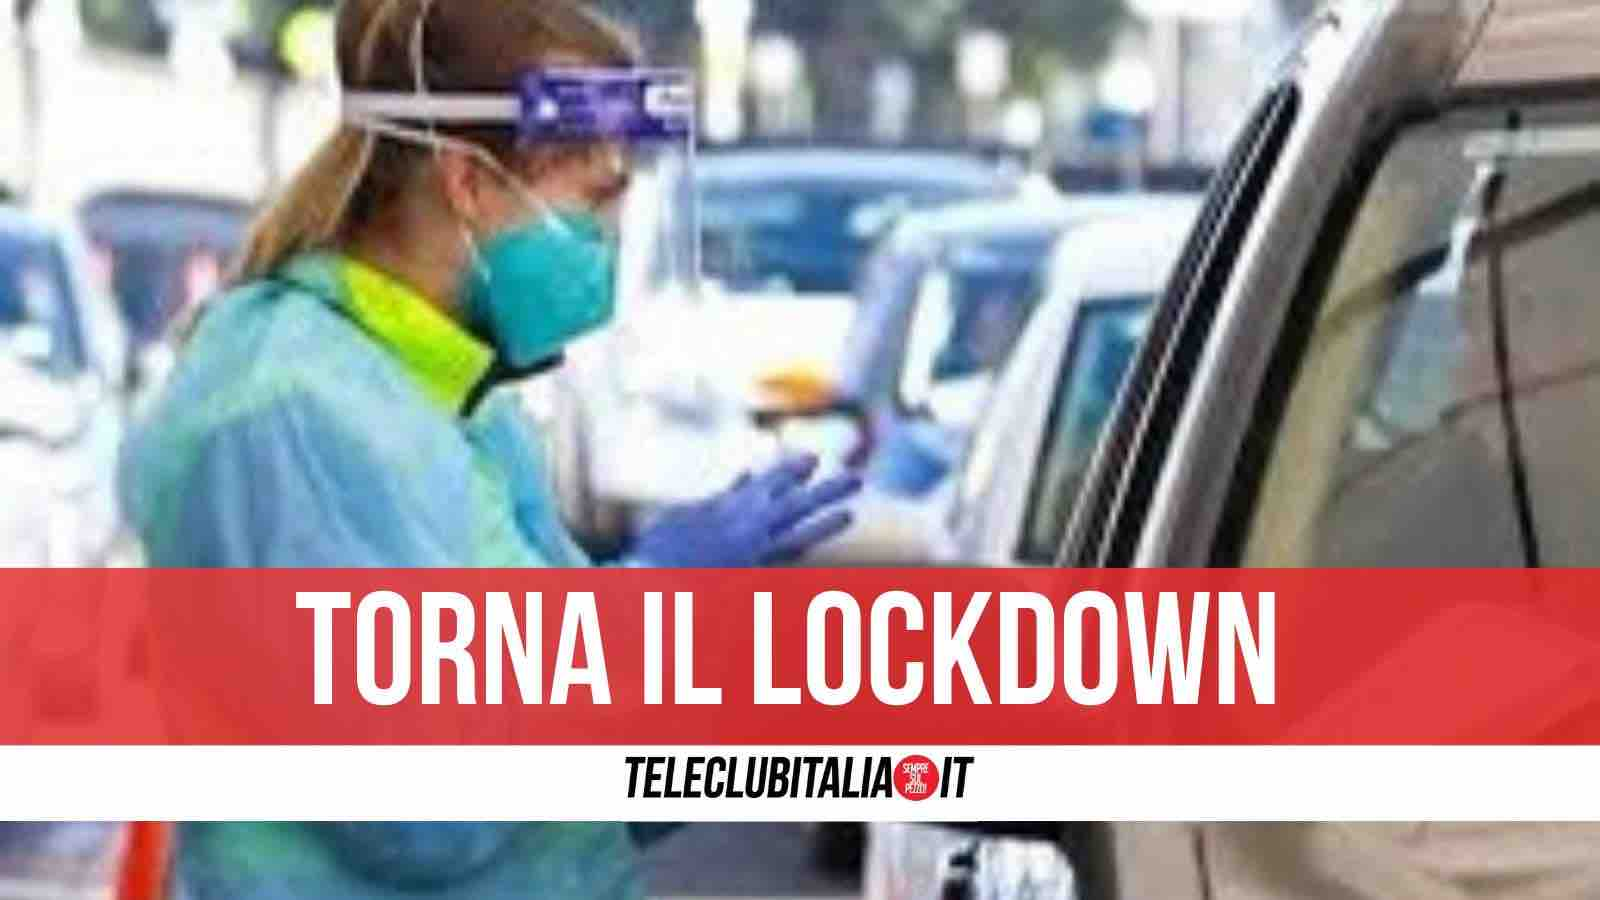 lockdown sydney